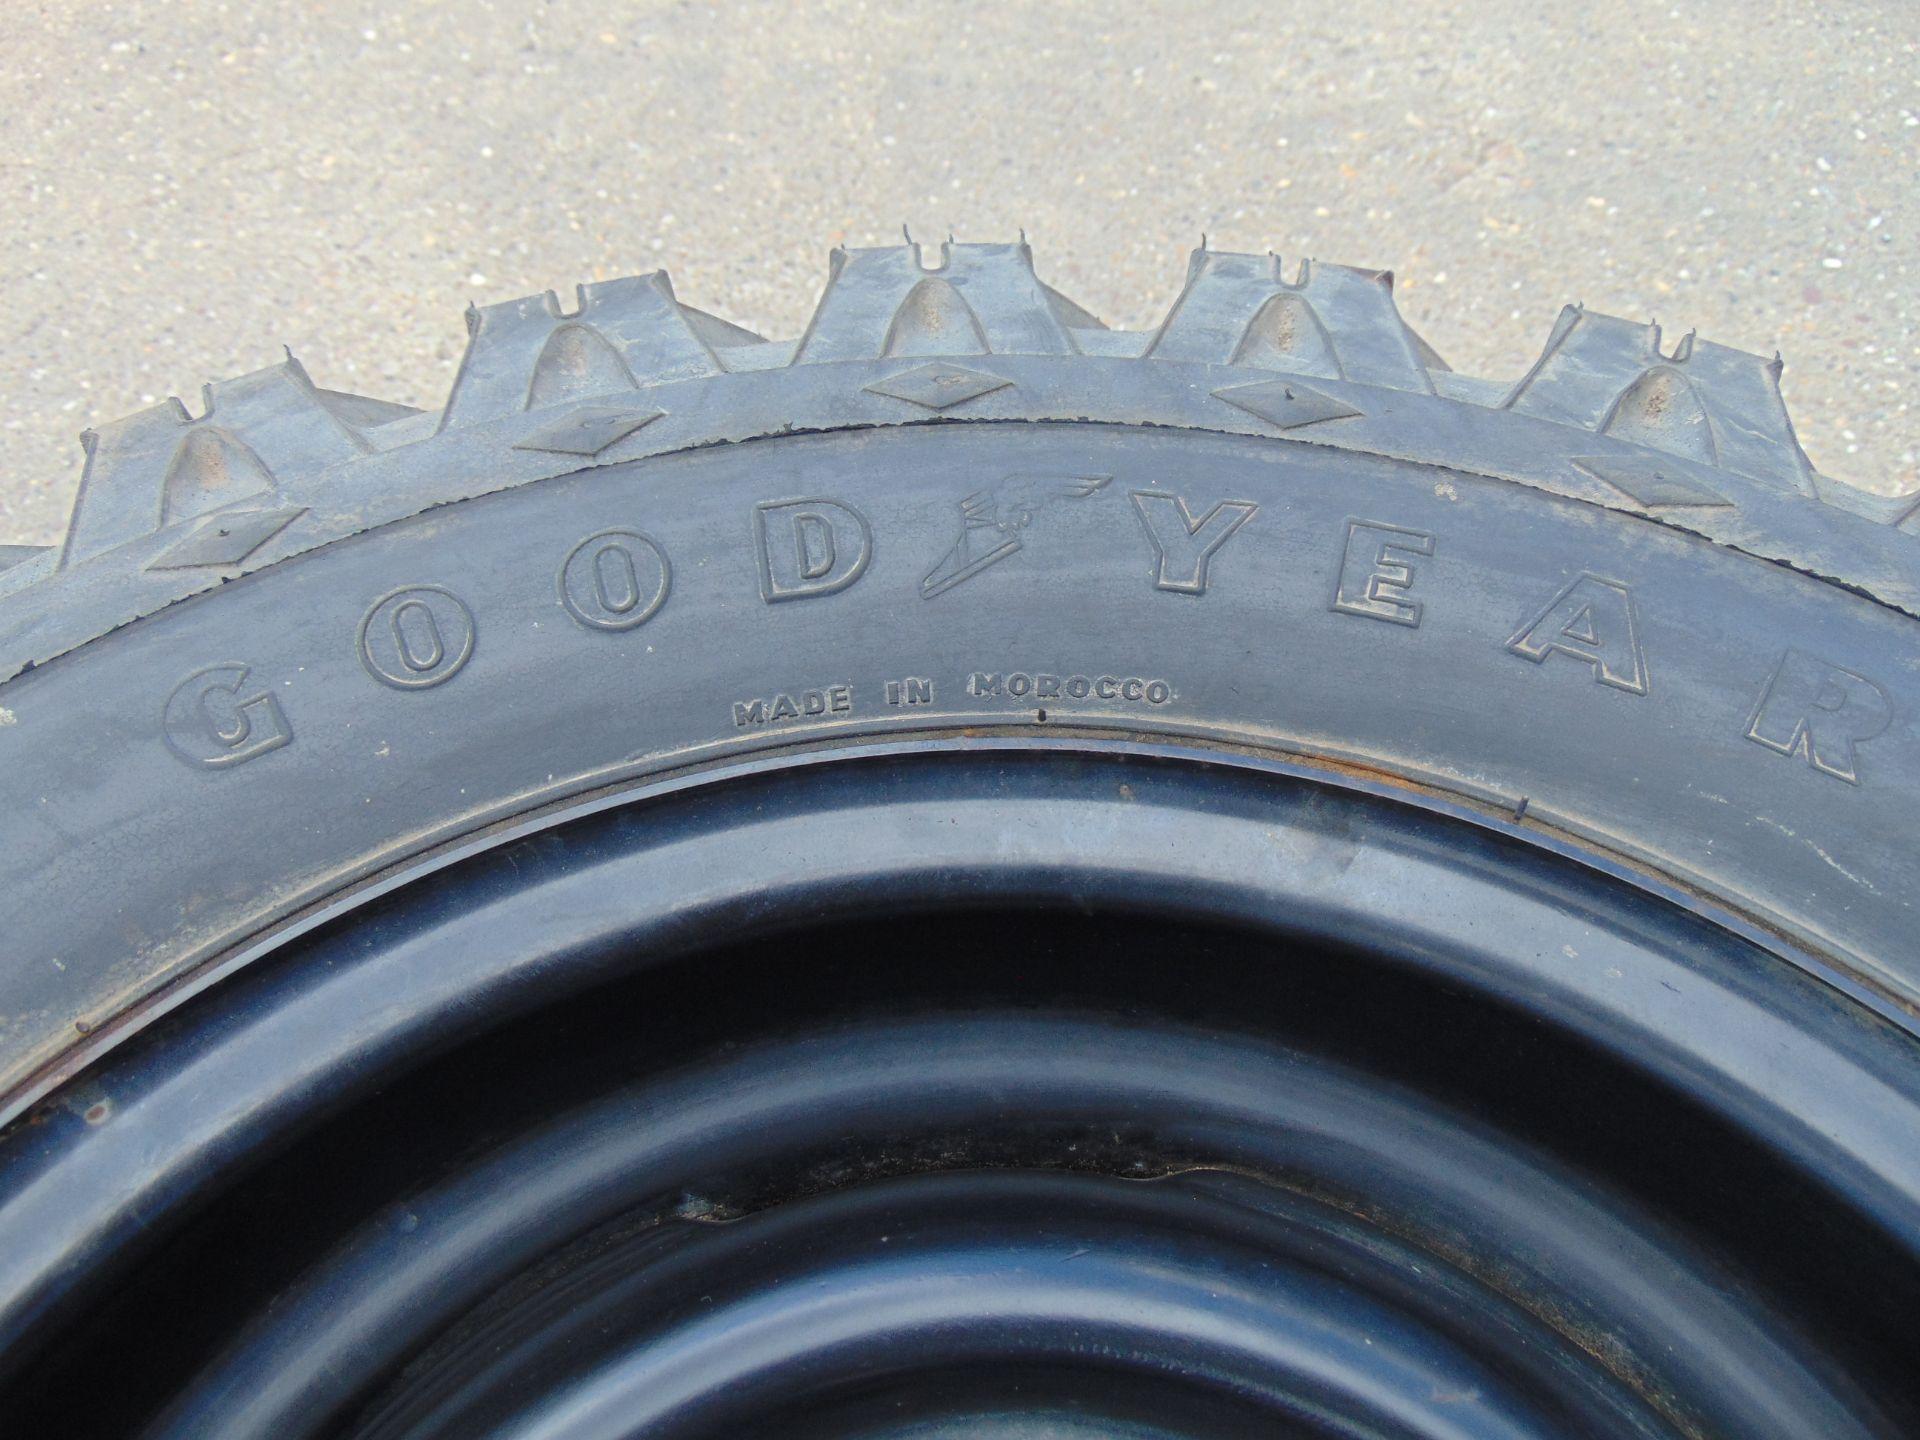 Lot 25 - 2 x Goodyear 7.50-16 Hi-Miler Xtra Grip Tyres C/W 5 Stud Rims